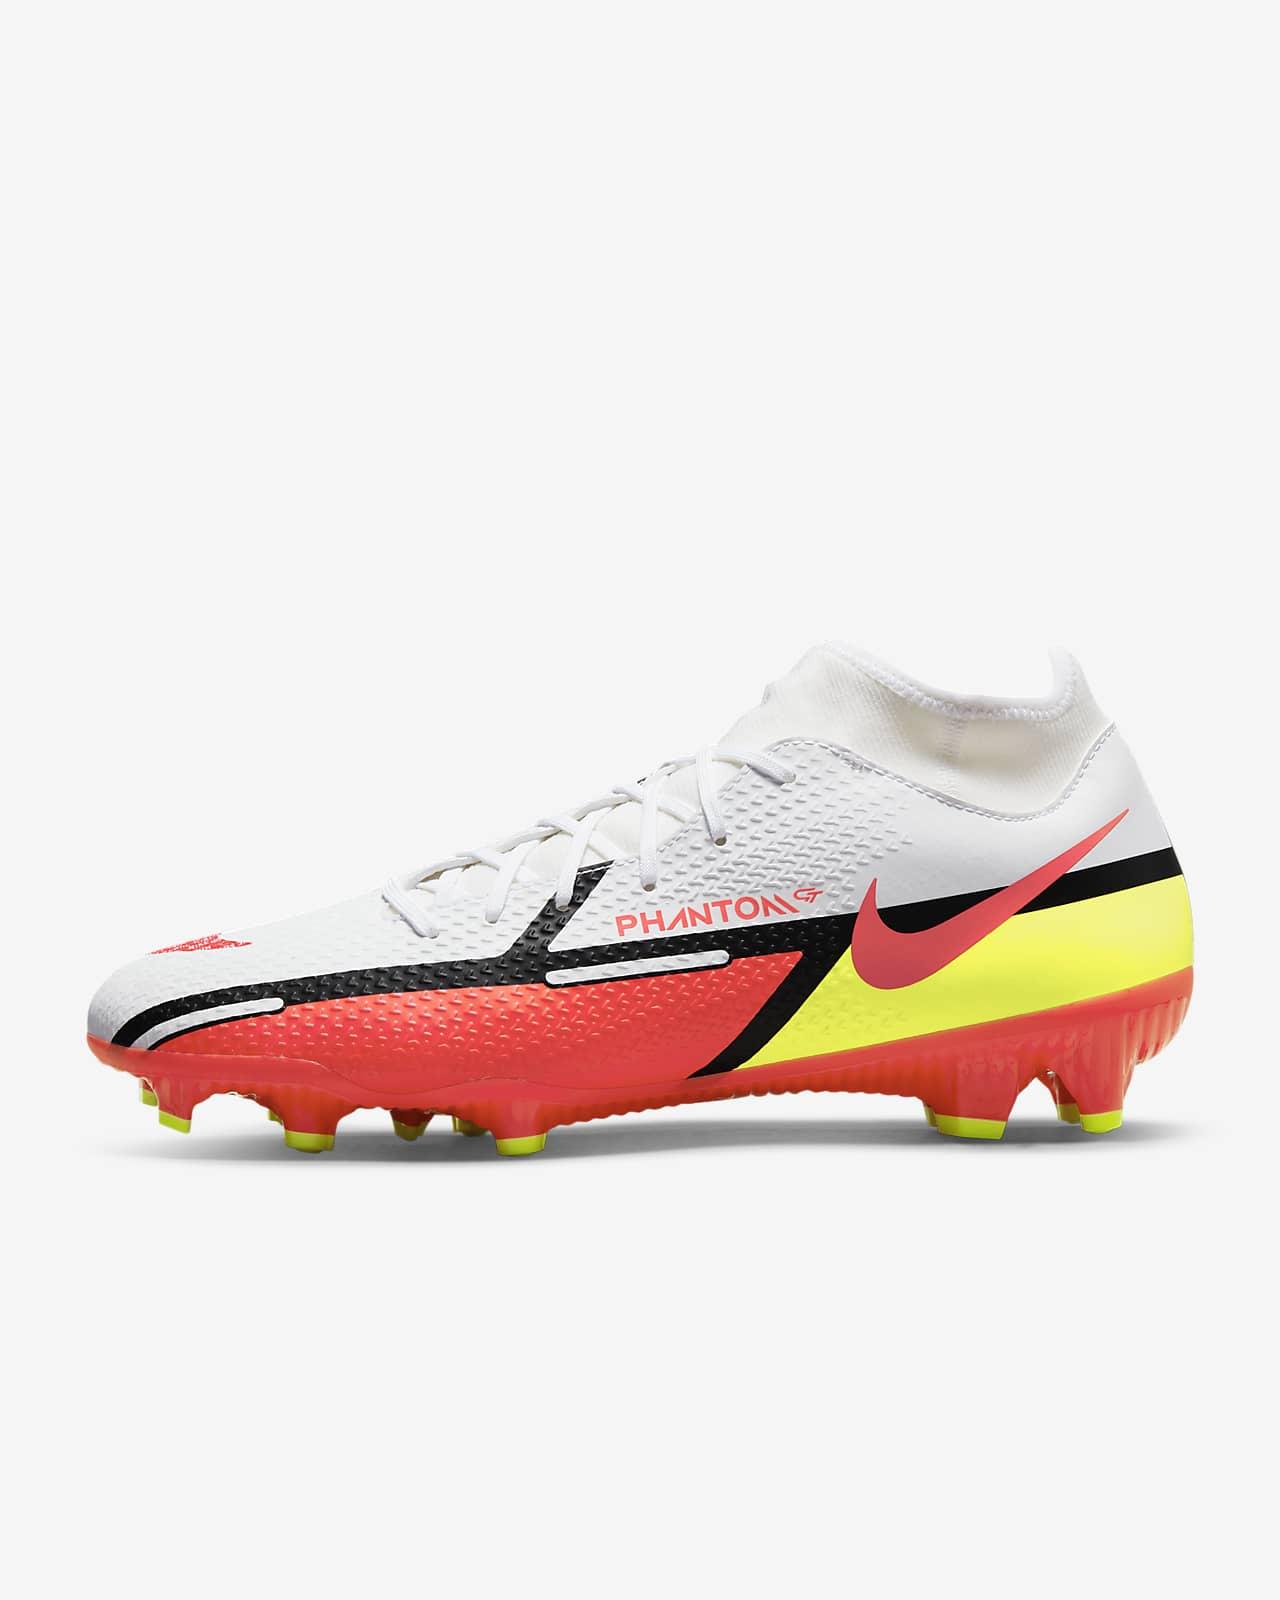 Nike Phantom GT2 Academy Dynamic Fit MG Multi-Ground Soccer Cleat